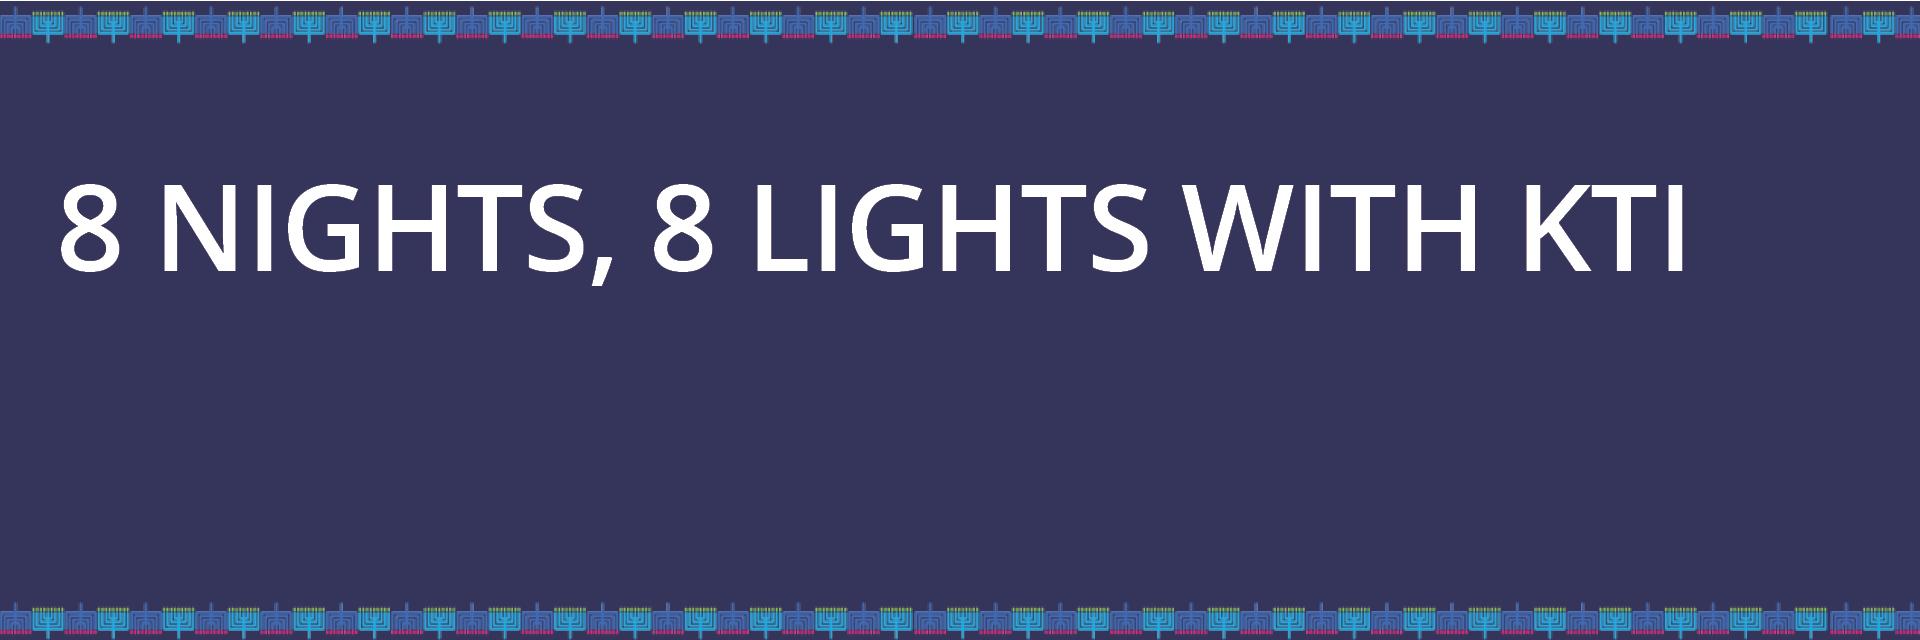 "<a href=""https://www.congkti.org/event/8-nights-8-lights-hanukkah-celebrations.html""                                     target="""">                                                                 <span class=""slider_title"">                                     Join us for 8 nights of Hanukkah!                                </span>                                                                 </a>                                                                                                                                                                                       <span class=""slider_description"">December 10 - 17</span>                                                                                     <a href=""https://www.congkti.org/event/8-nights-8-lights-hanukkah-celebrations.html"" class=""slider_link""                             target="""">                             Information on all Hanukkah programs & activities here....                            </a>"